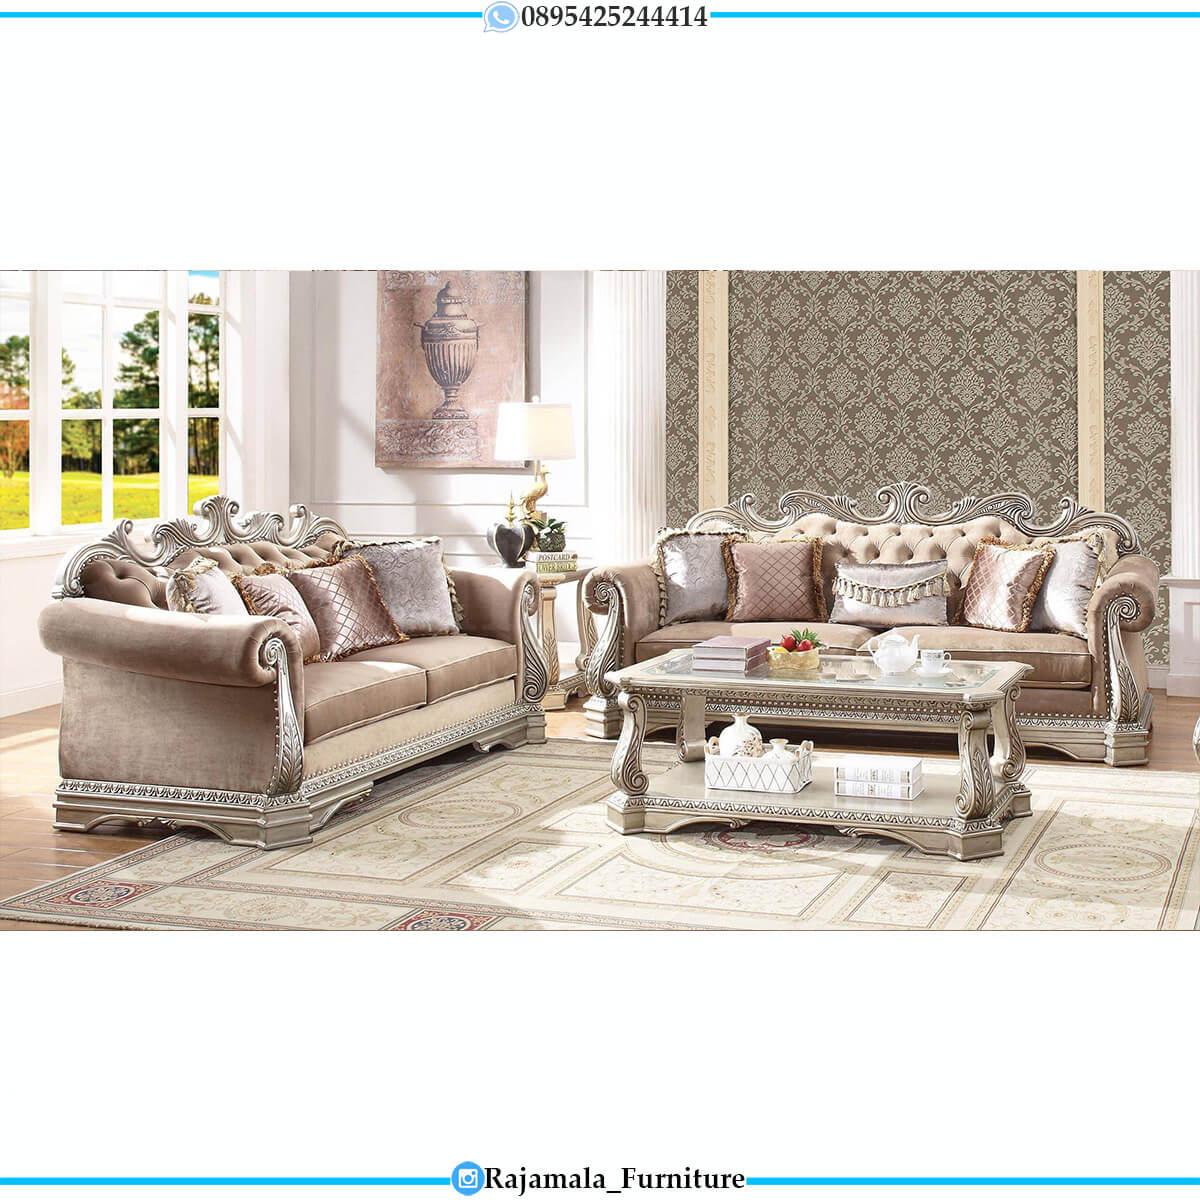 New Set Sofa Tamu Mewah Ukiran Jepara Excellent Color RM-0727